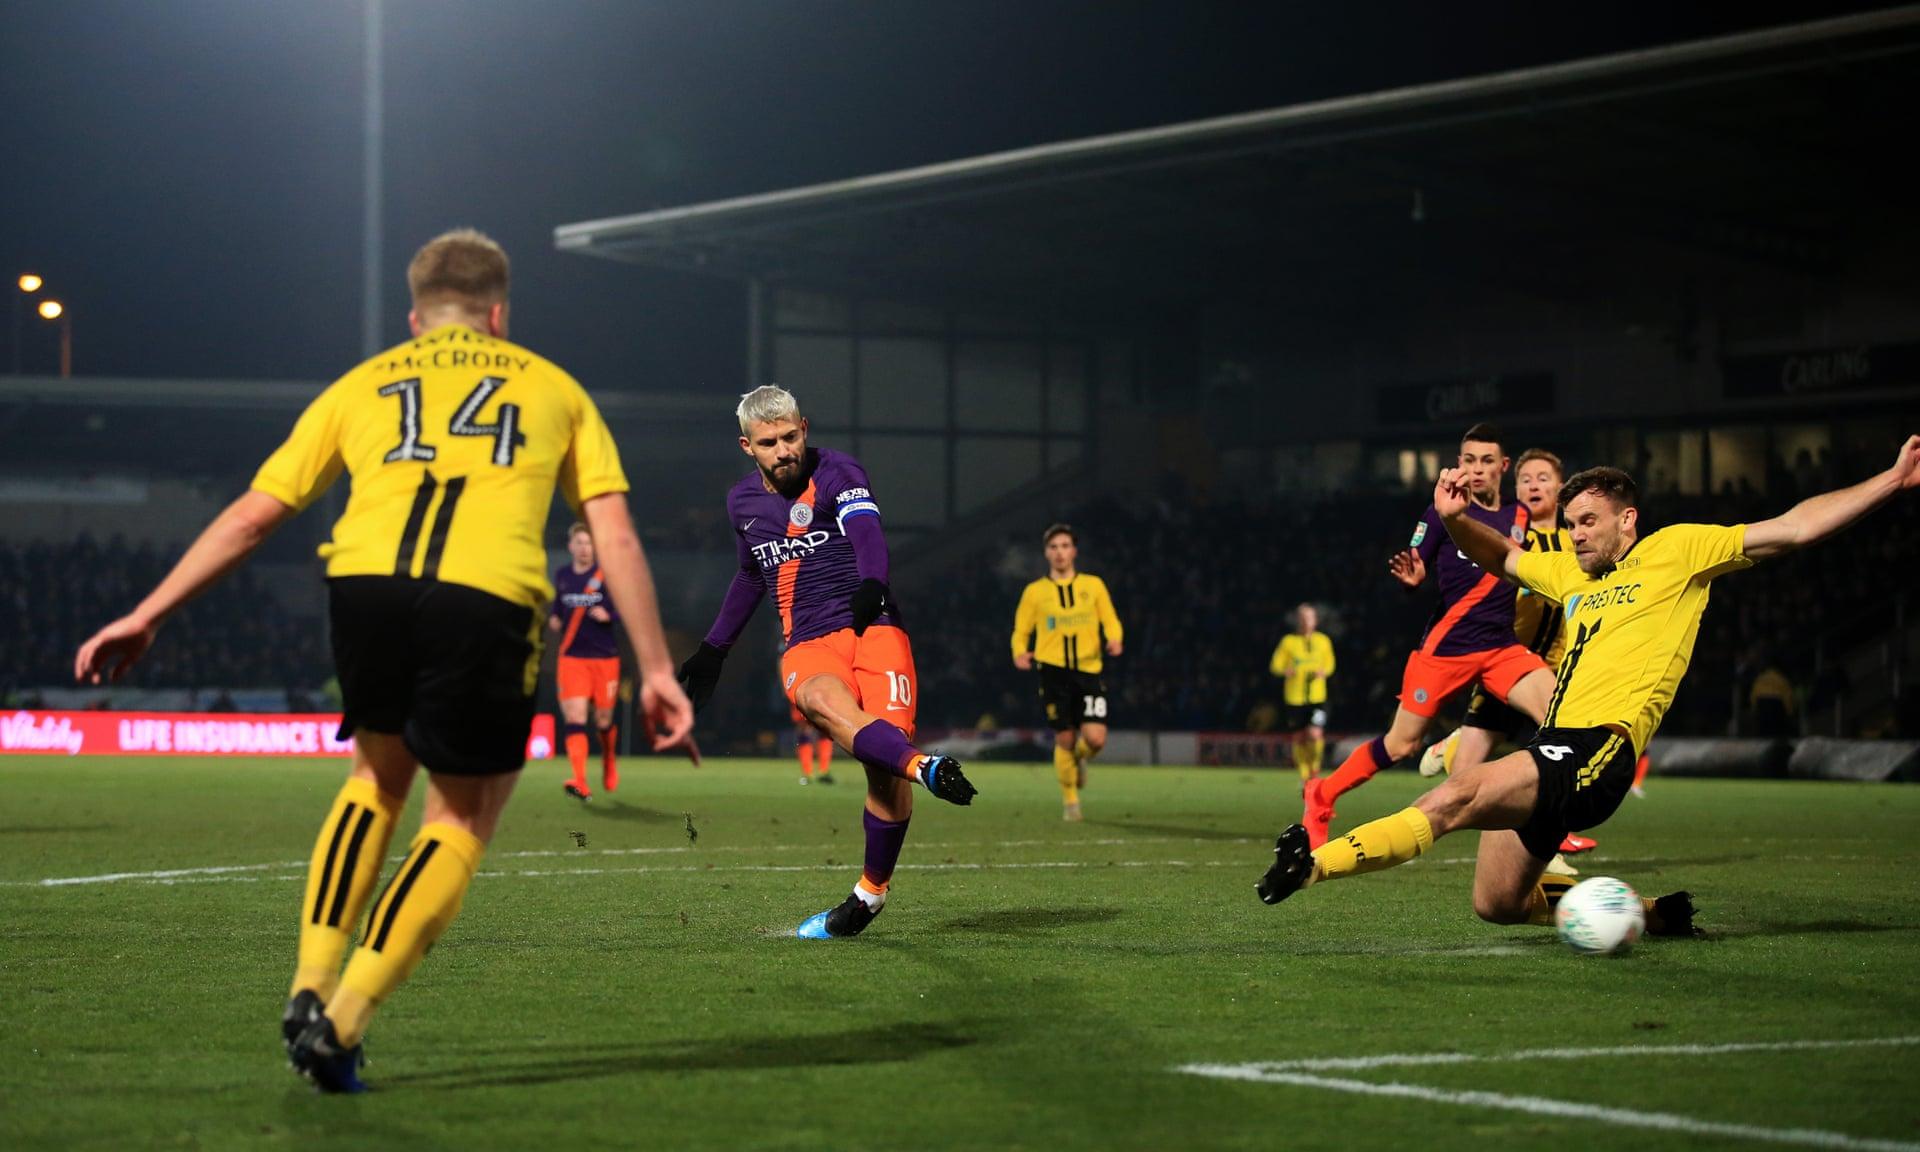 League Cup: Στον τελικό με 10-0 η Σίτι